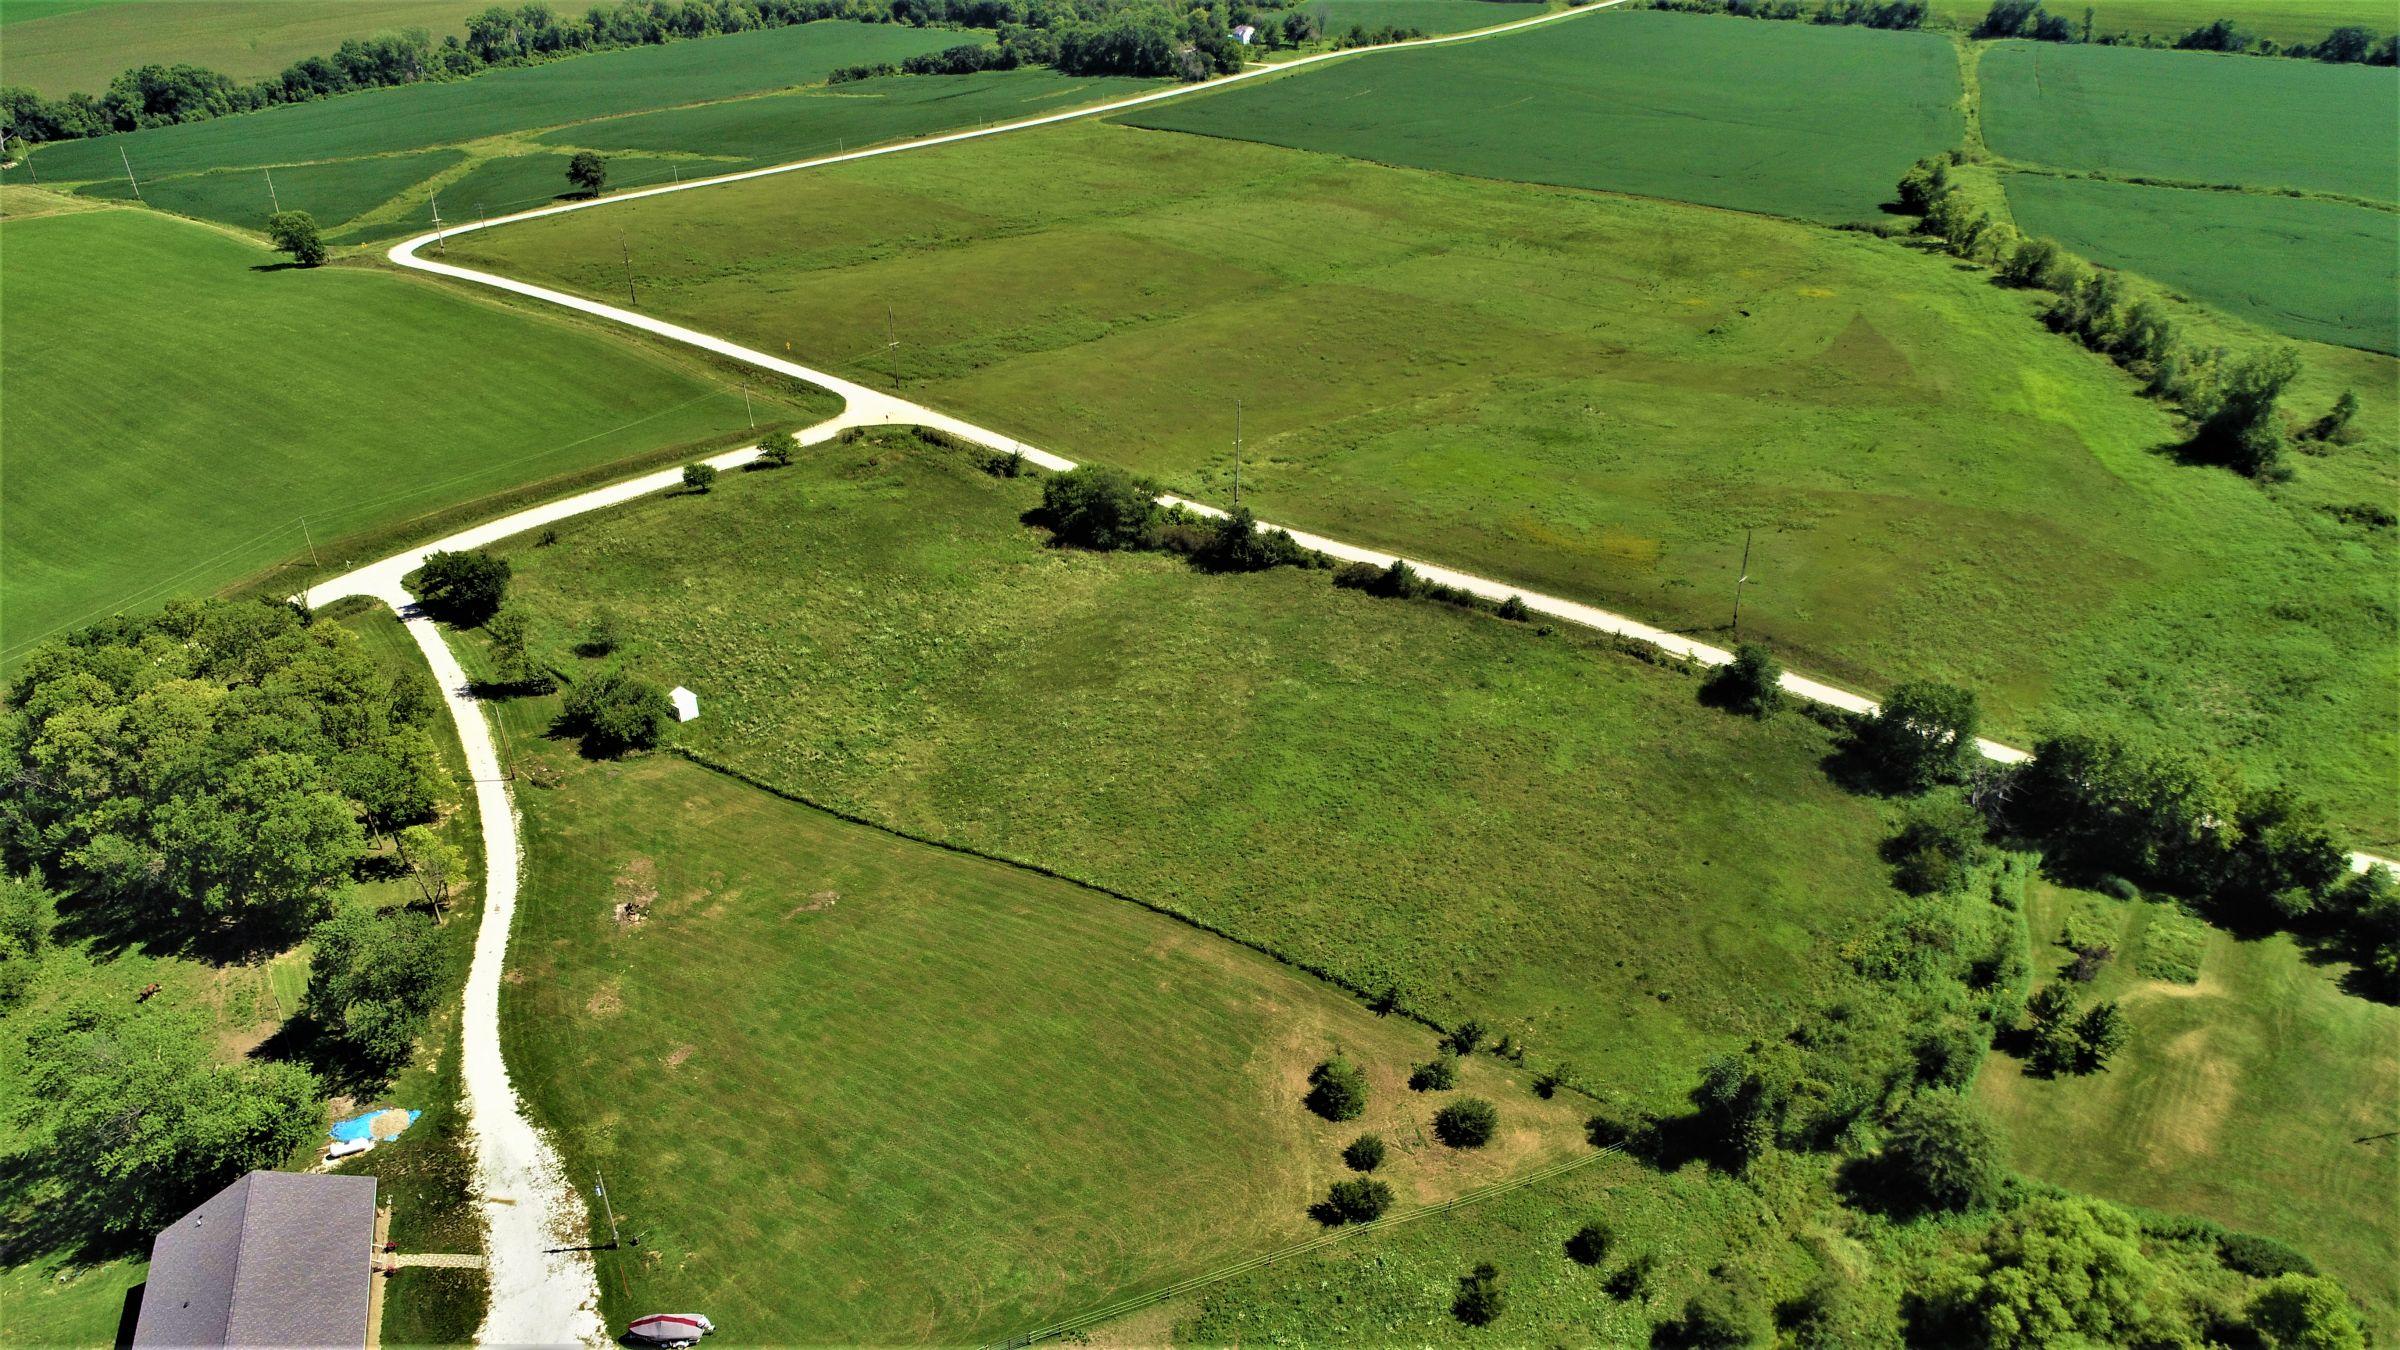 land-warren-county-iowa-6-acres-listing-number-15709-5-2021-08-27-202008.JPG